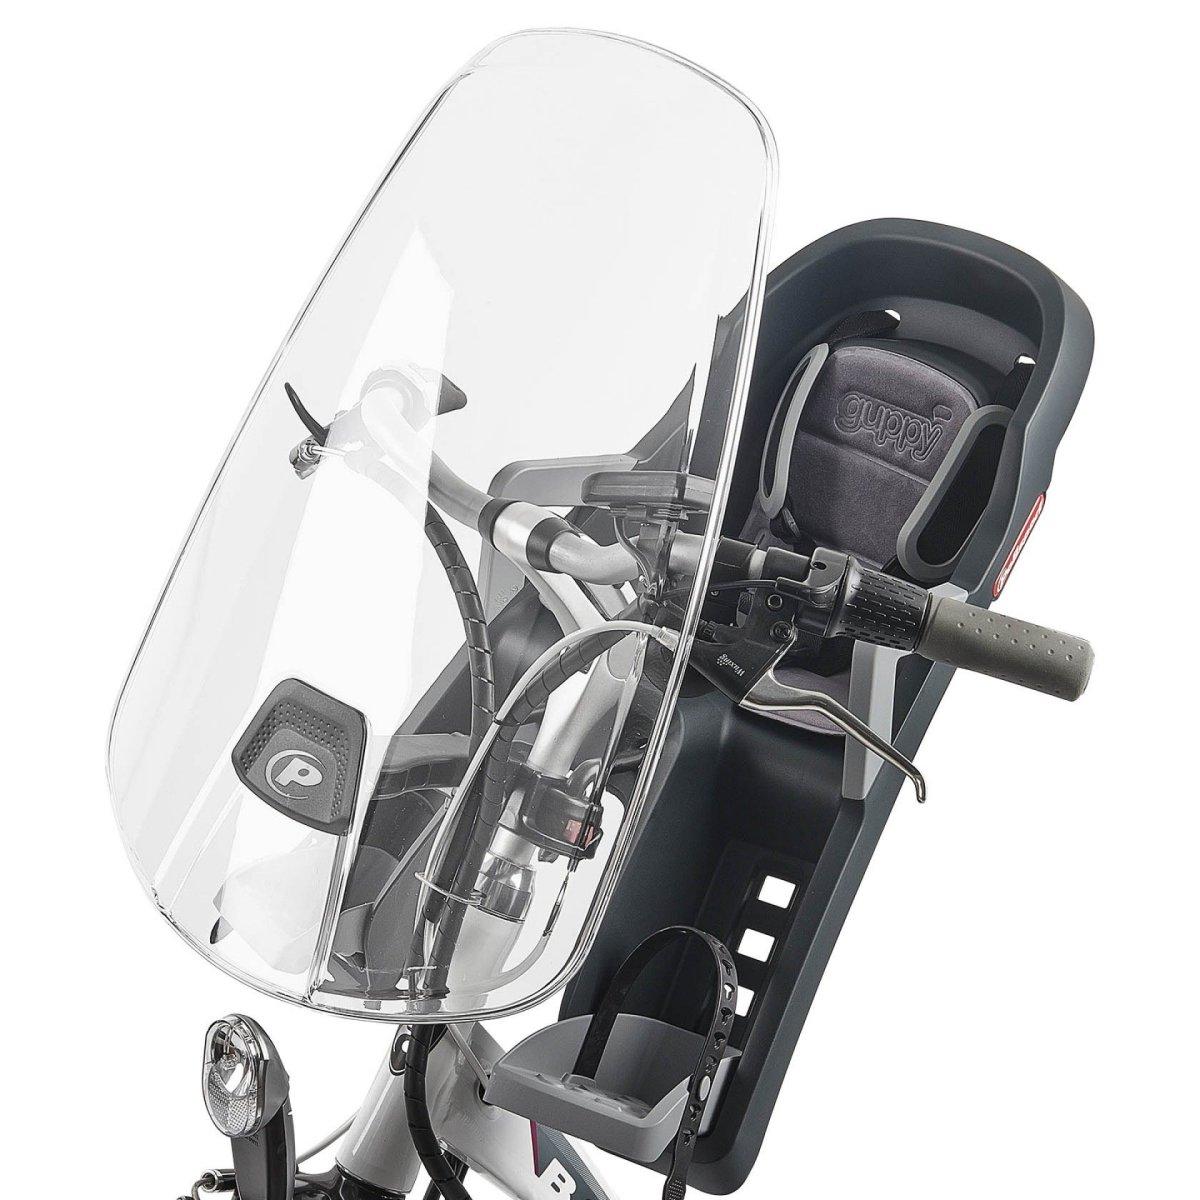 Vējstikls velosēdeklim Polisport WINDSCREEN FRONT SEATS